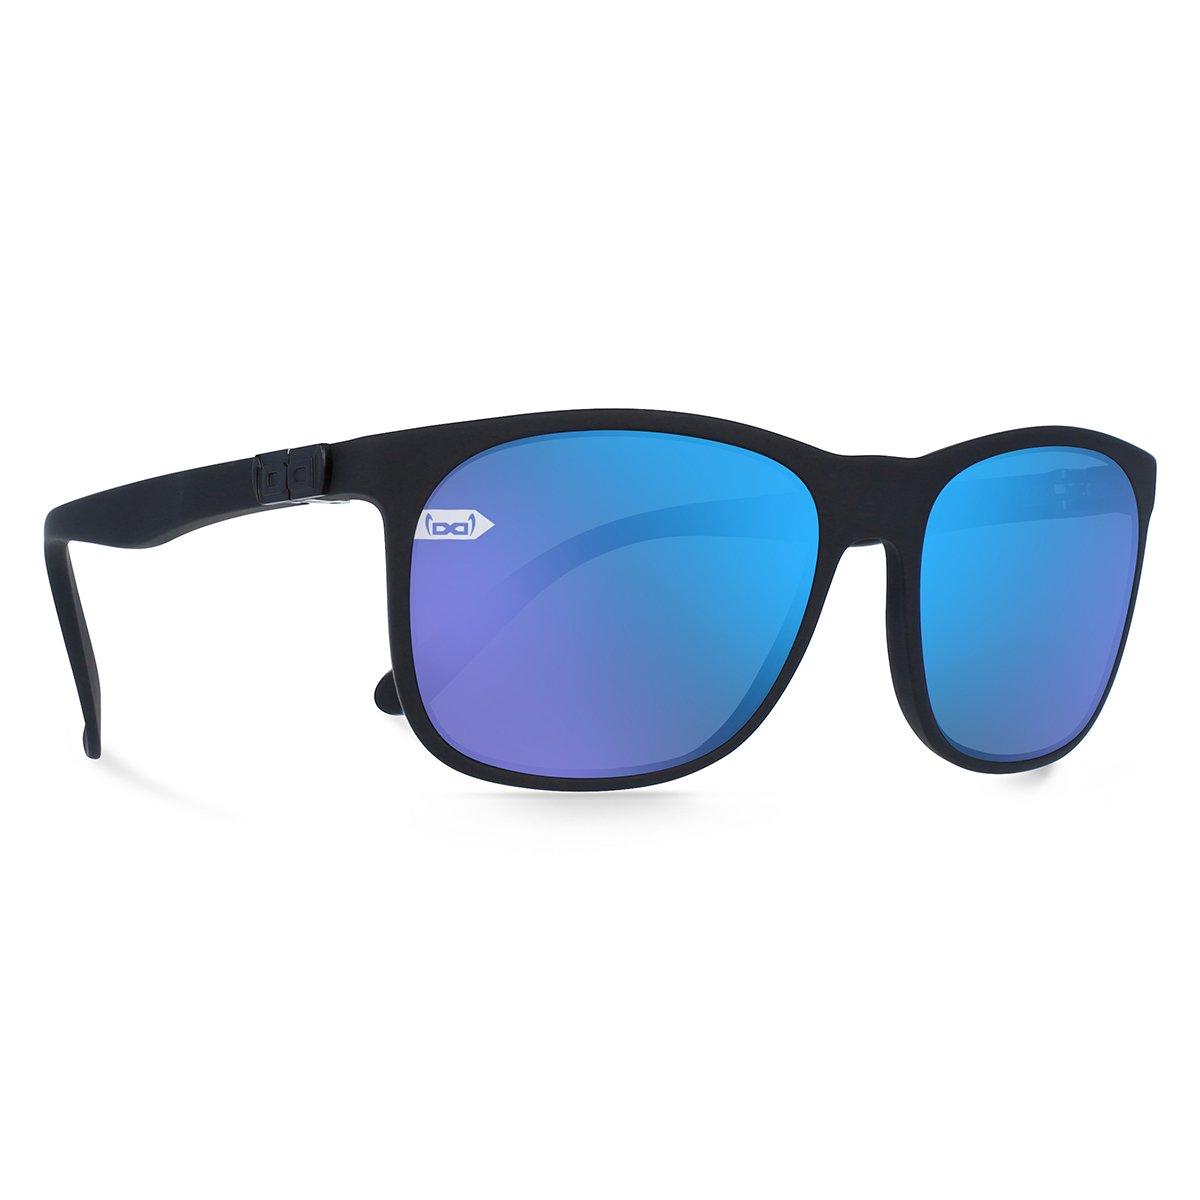 Black Gloryfy GI22 Amadeus Sun Sunglasses ALL MODELS